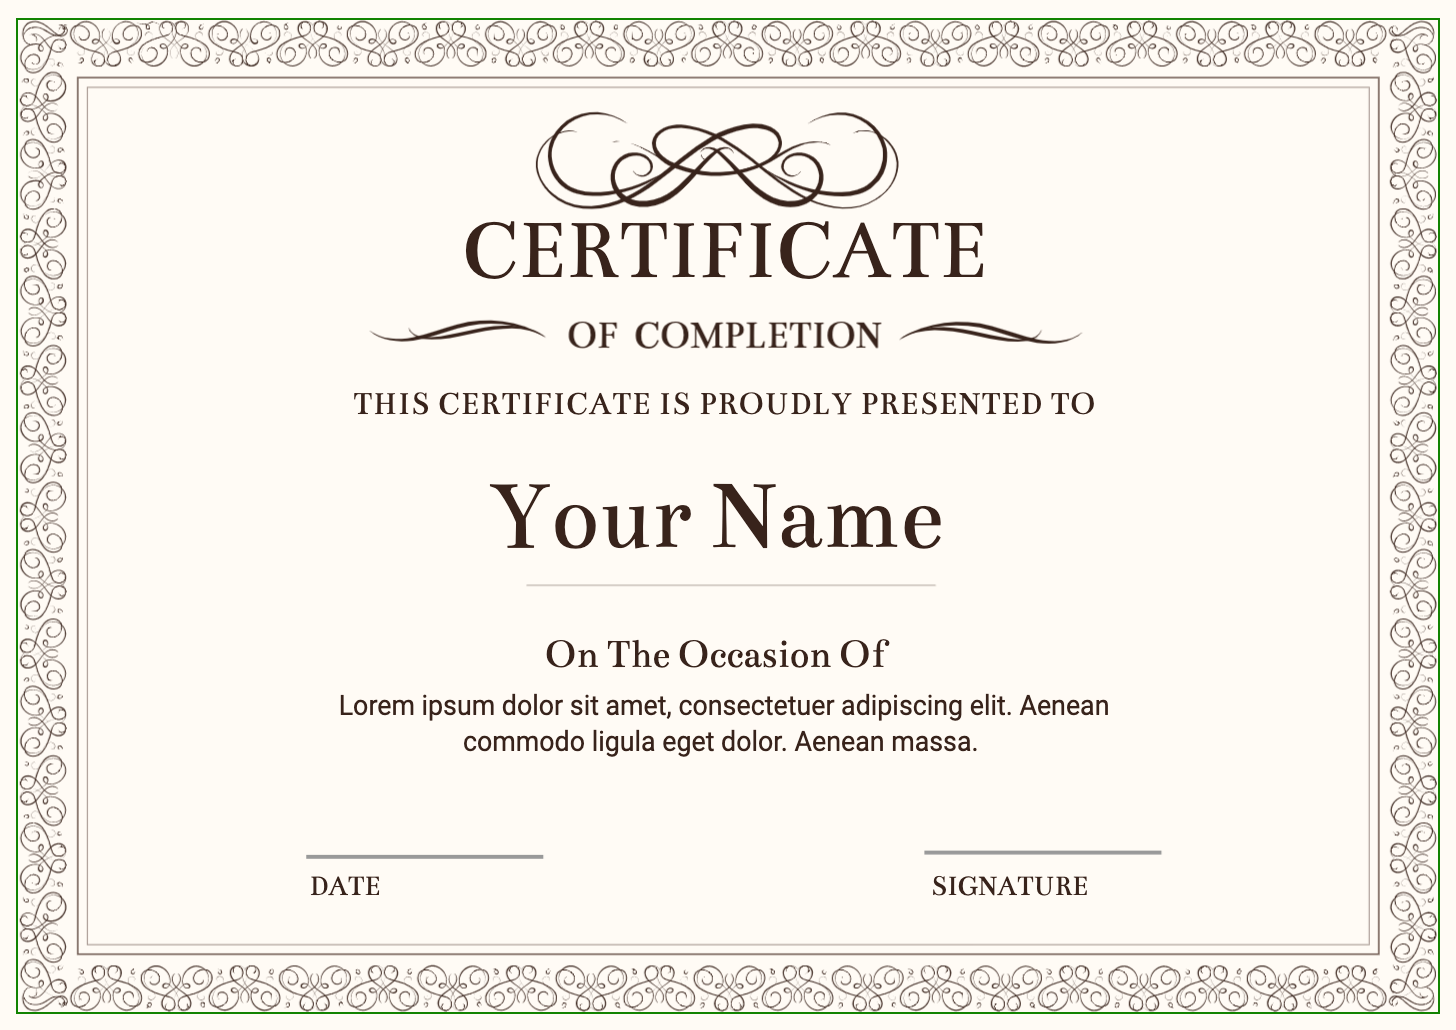 Certificates | Design Online